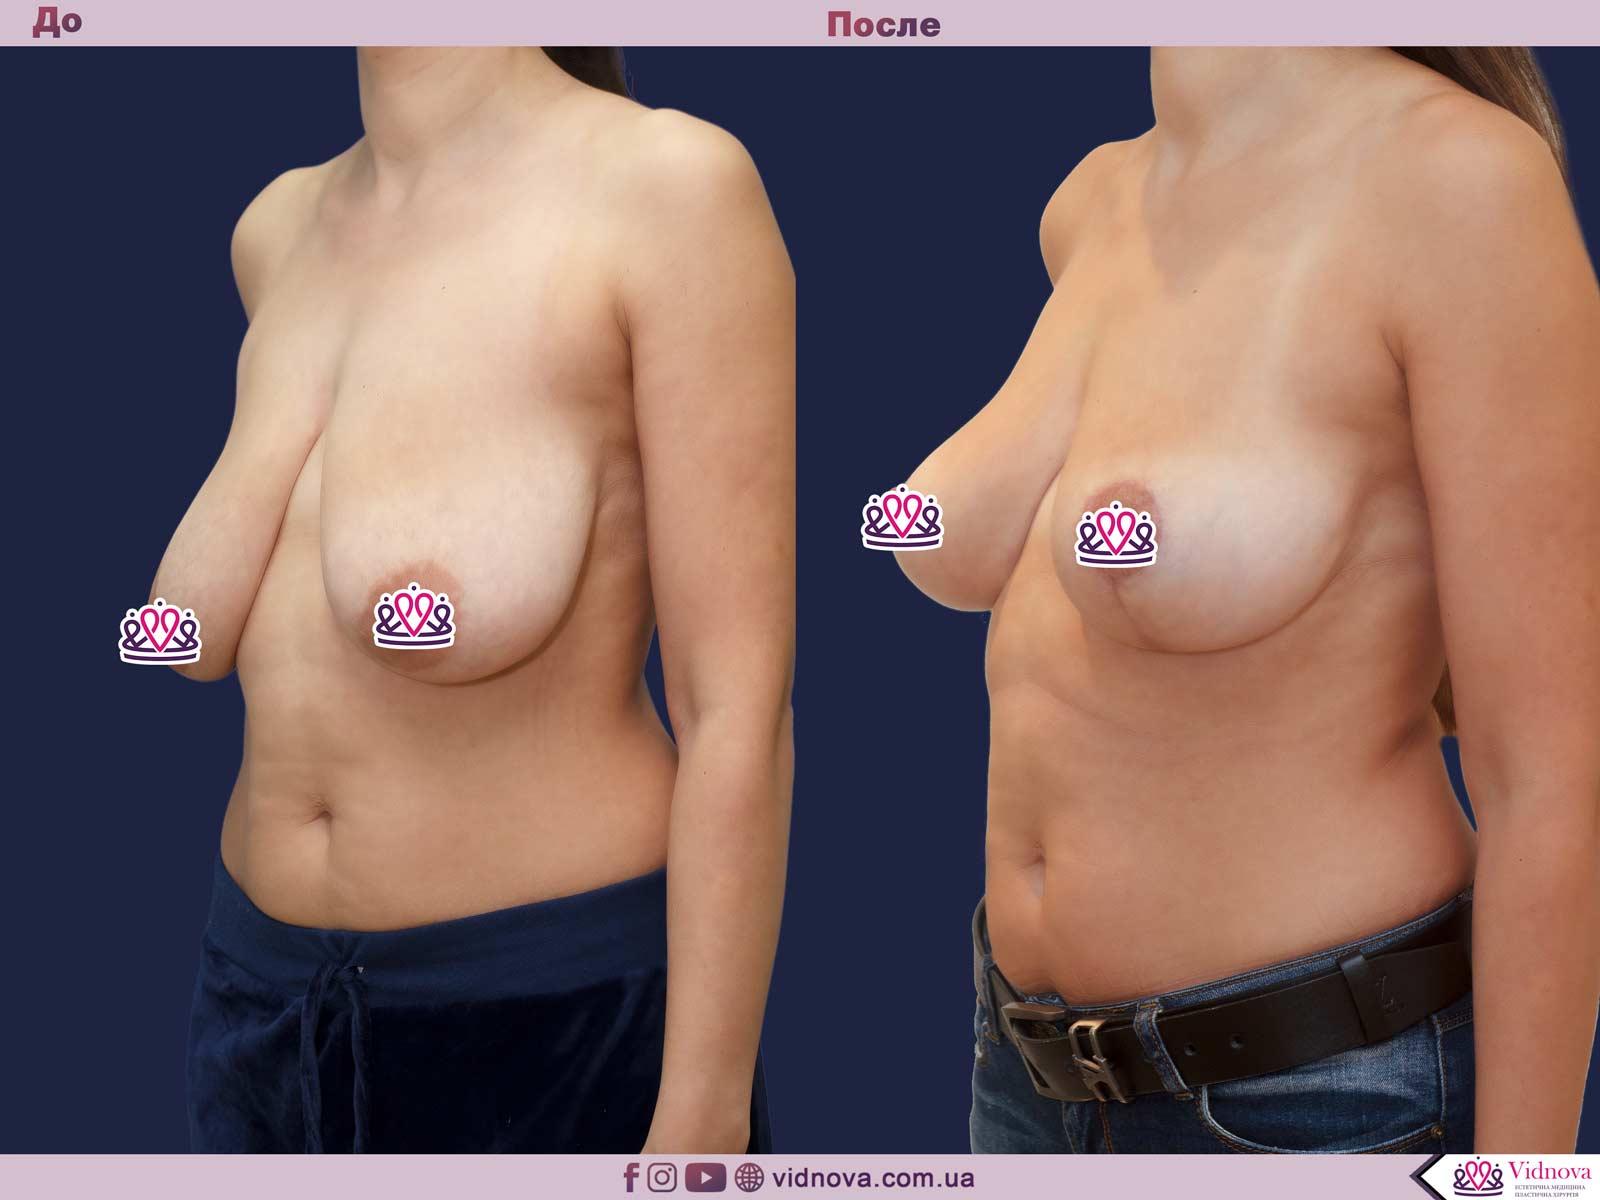 Подтяжка груди: Фото ДО и ПОСЛЕ - Пример №24-2 - Клиника Vidnova